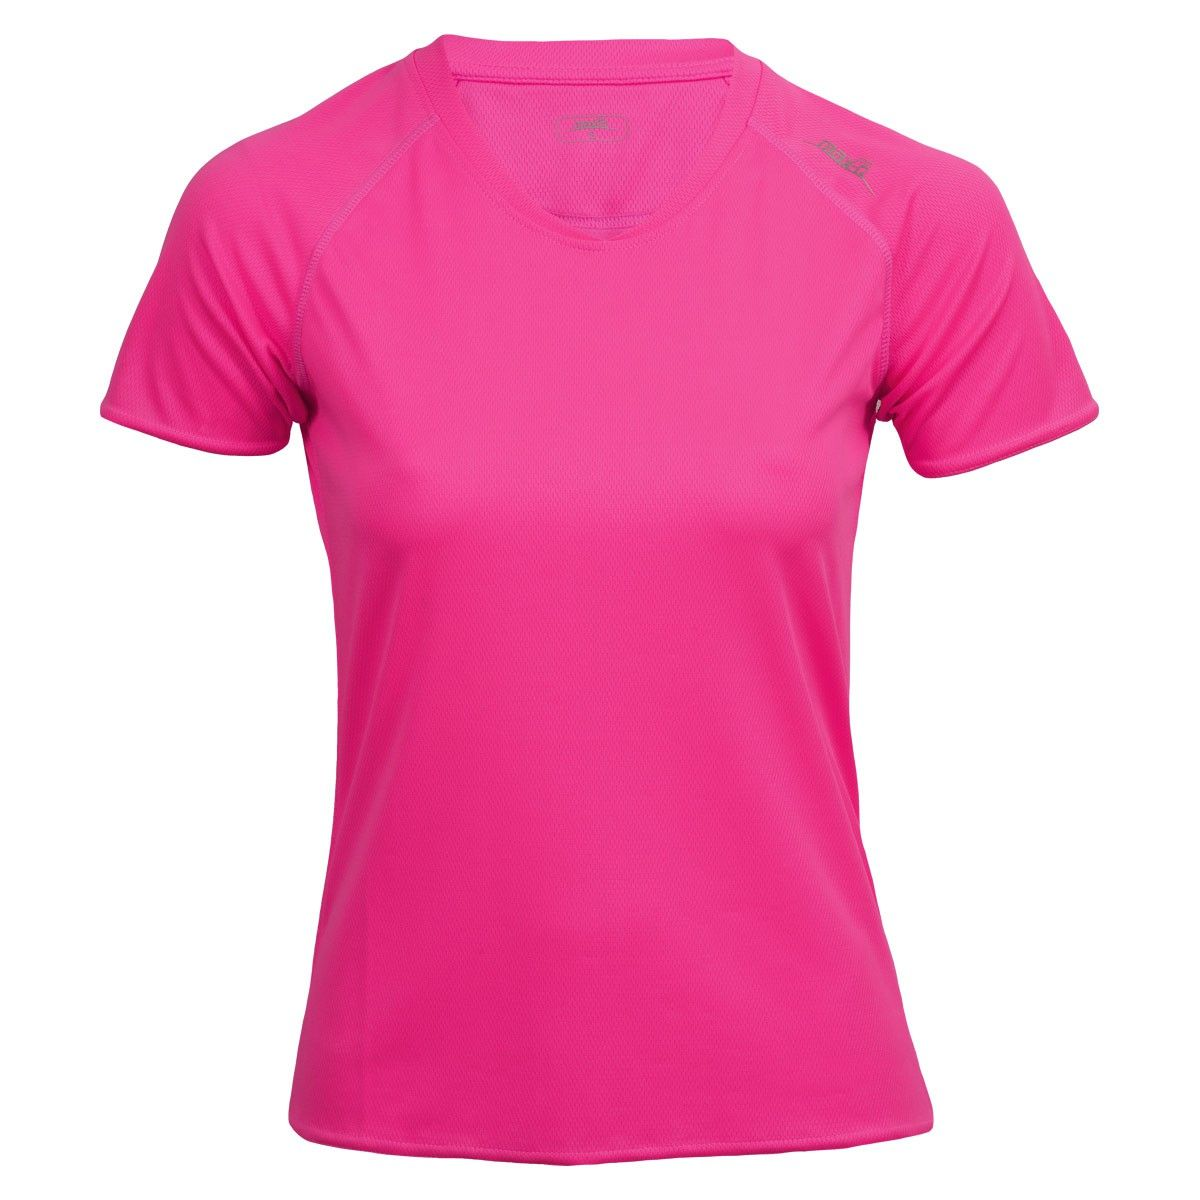 max Basic Running Shirt | Damen Laufshirt Pink | 21run